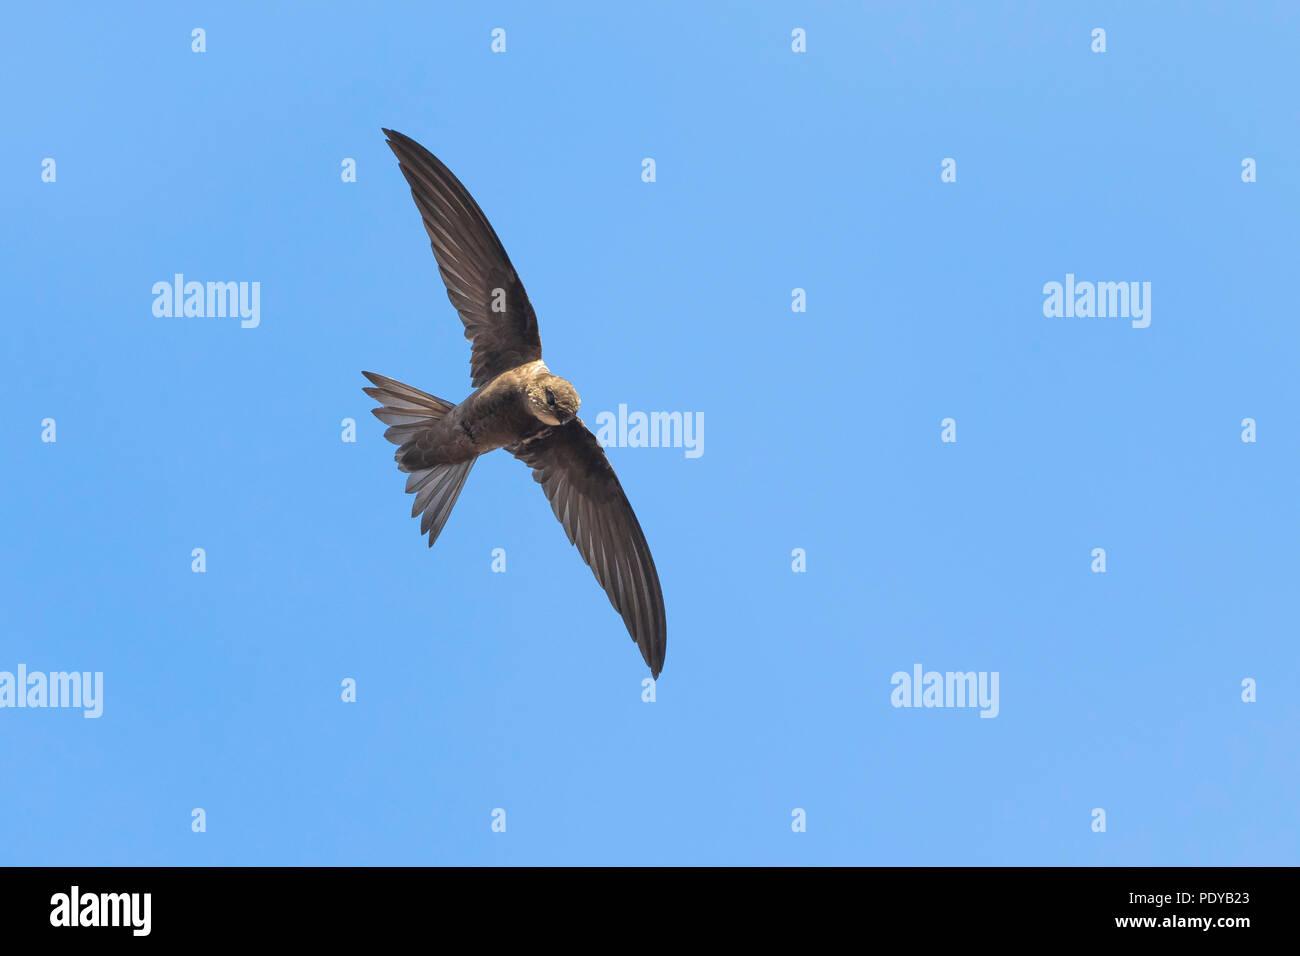 Cape Verde Swift; Apus alexandri - Stock Image